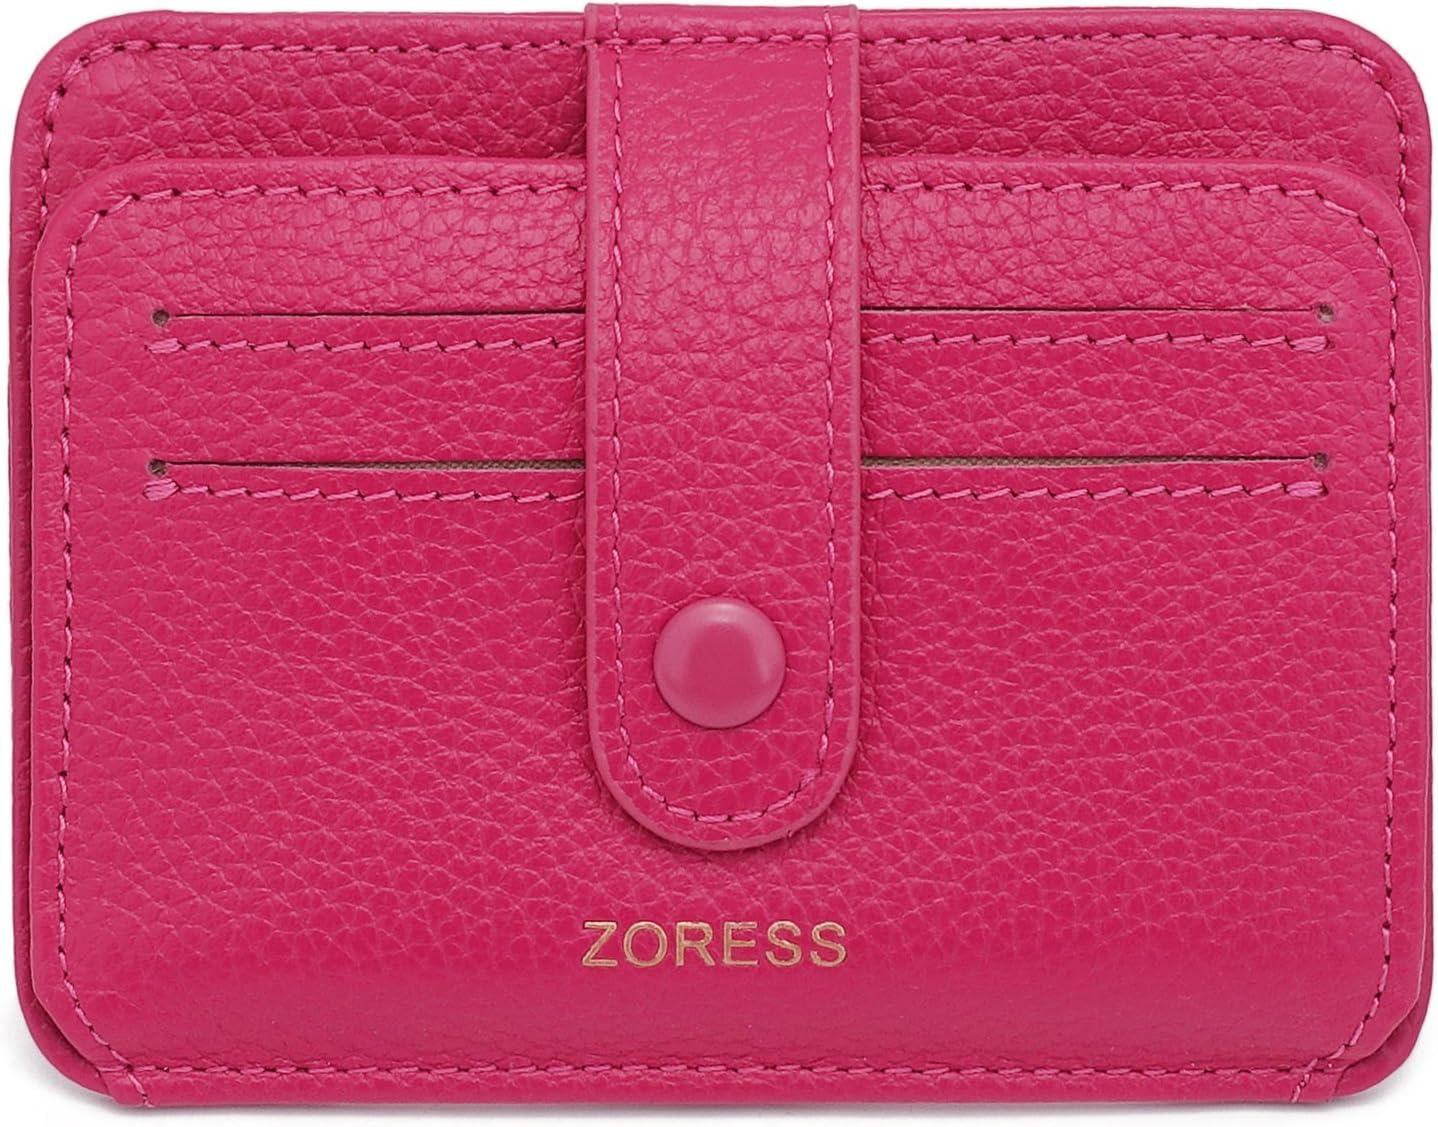 New Women/'s Wallet RFID Blocking Credit Cards Holder Bifold Purse Wear Resistant